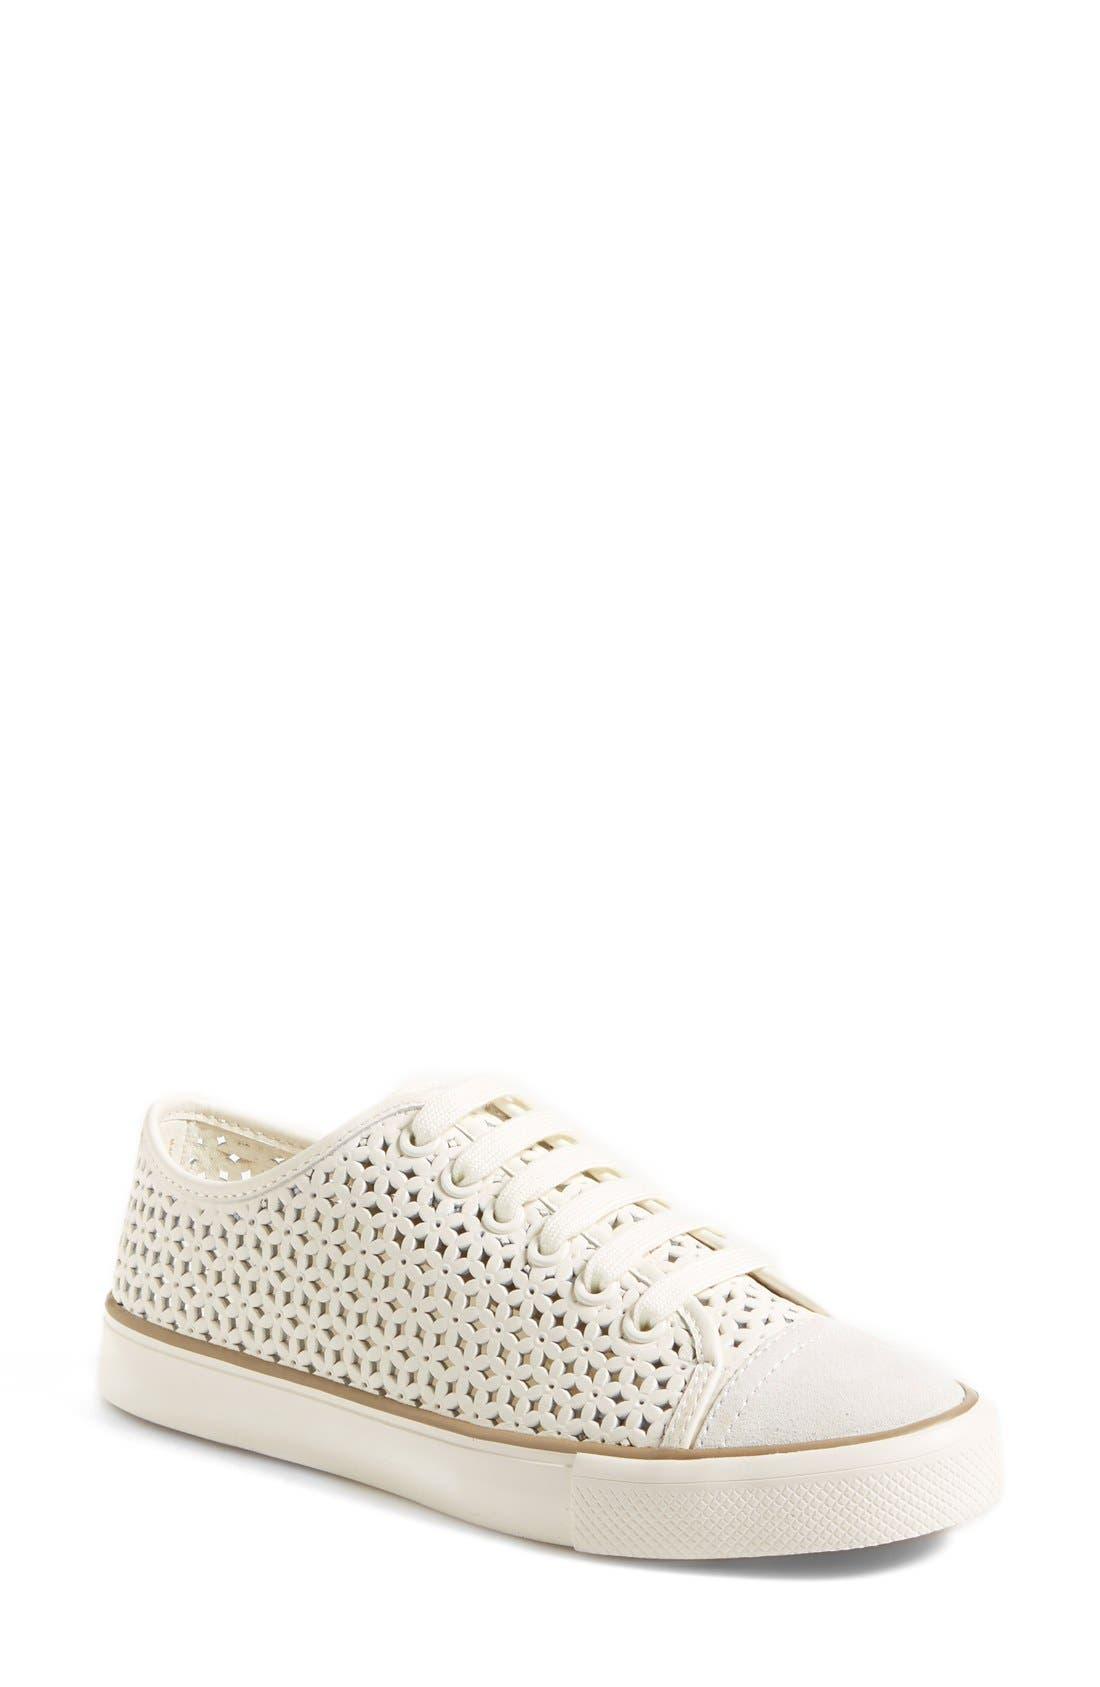 Main Image - Tory Burch 'Daisy' Perforated Sneaker (Women)